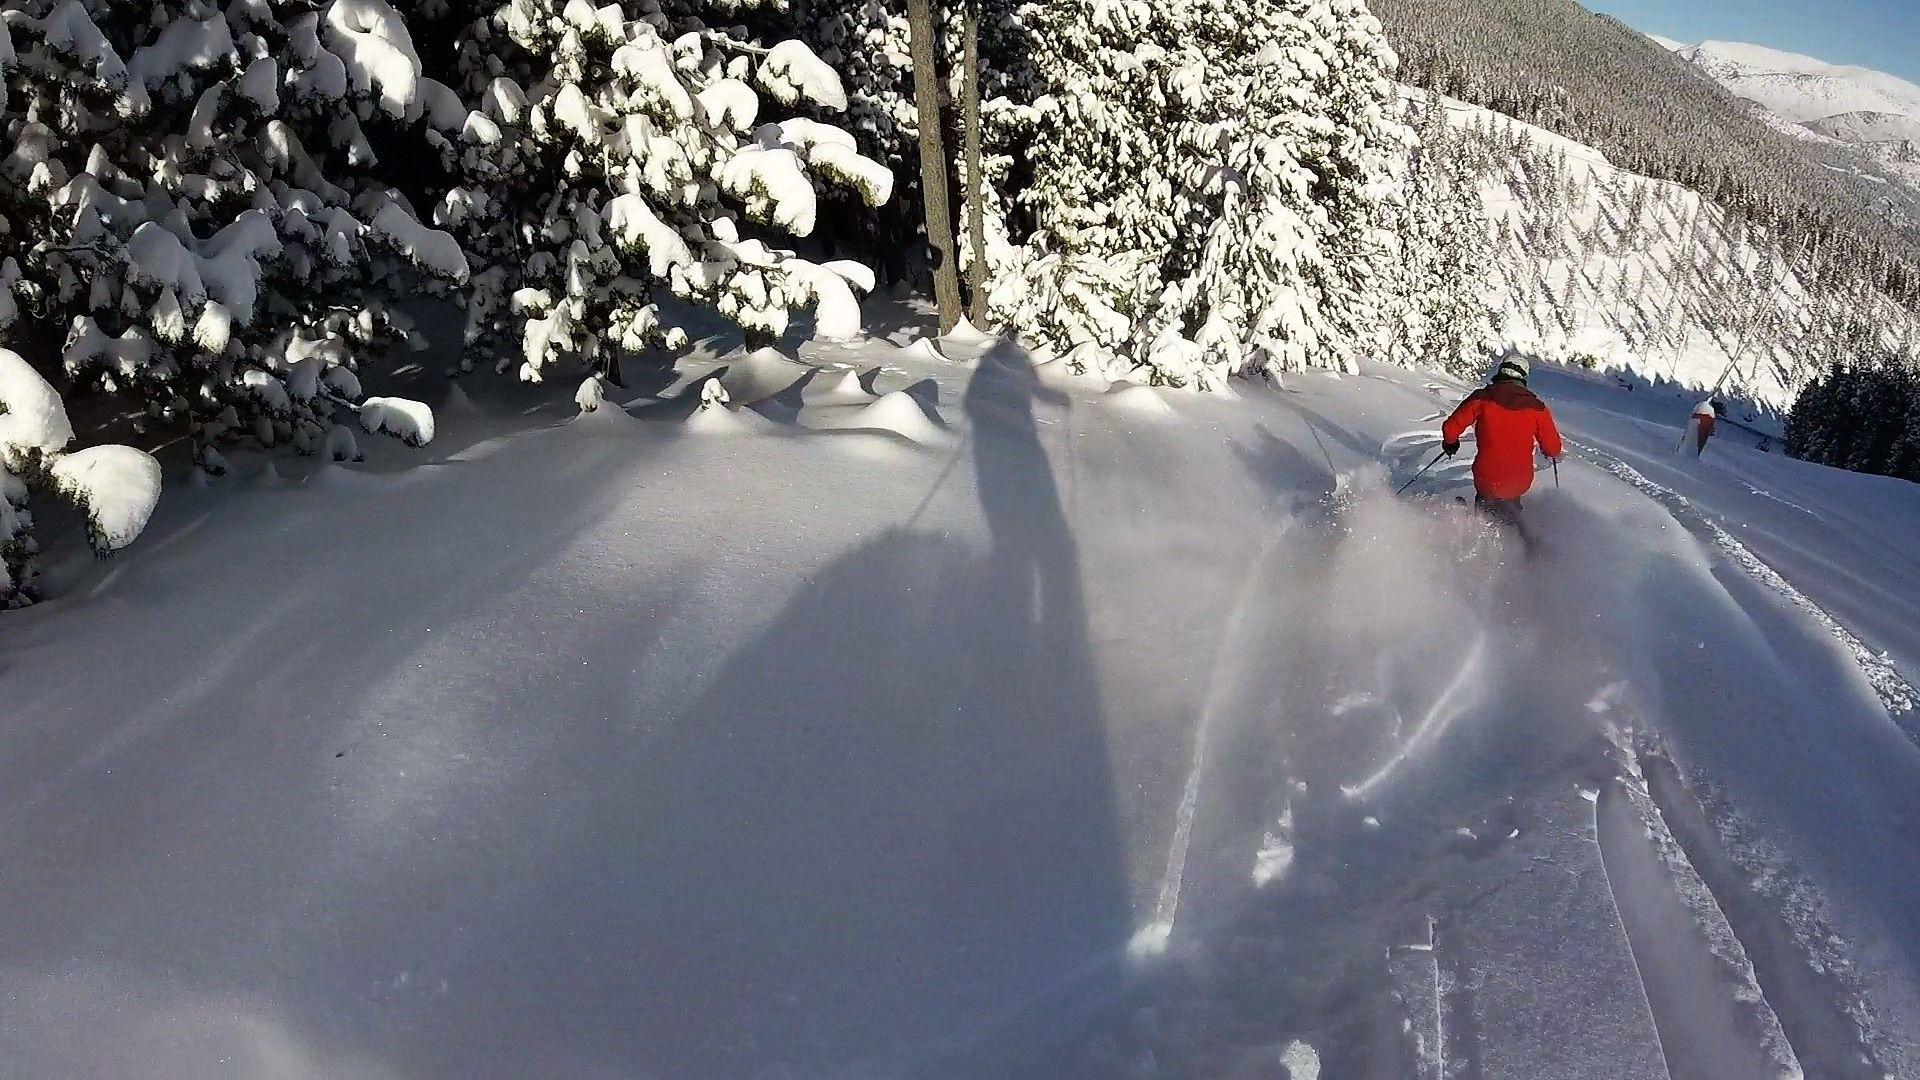 Nieve polvo